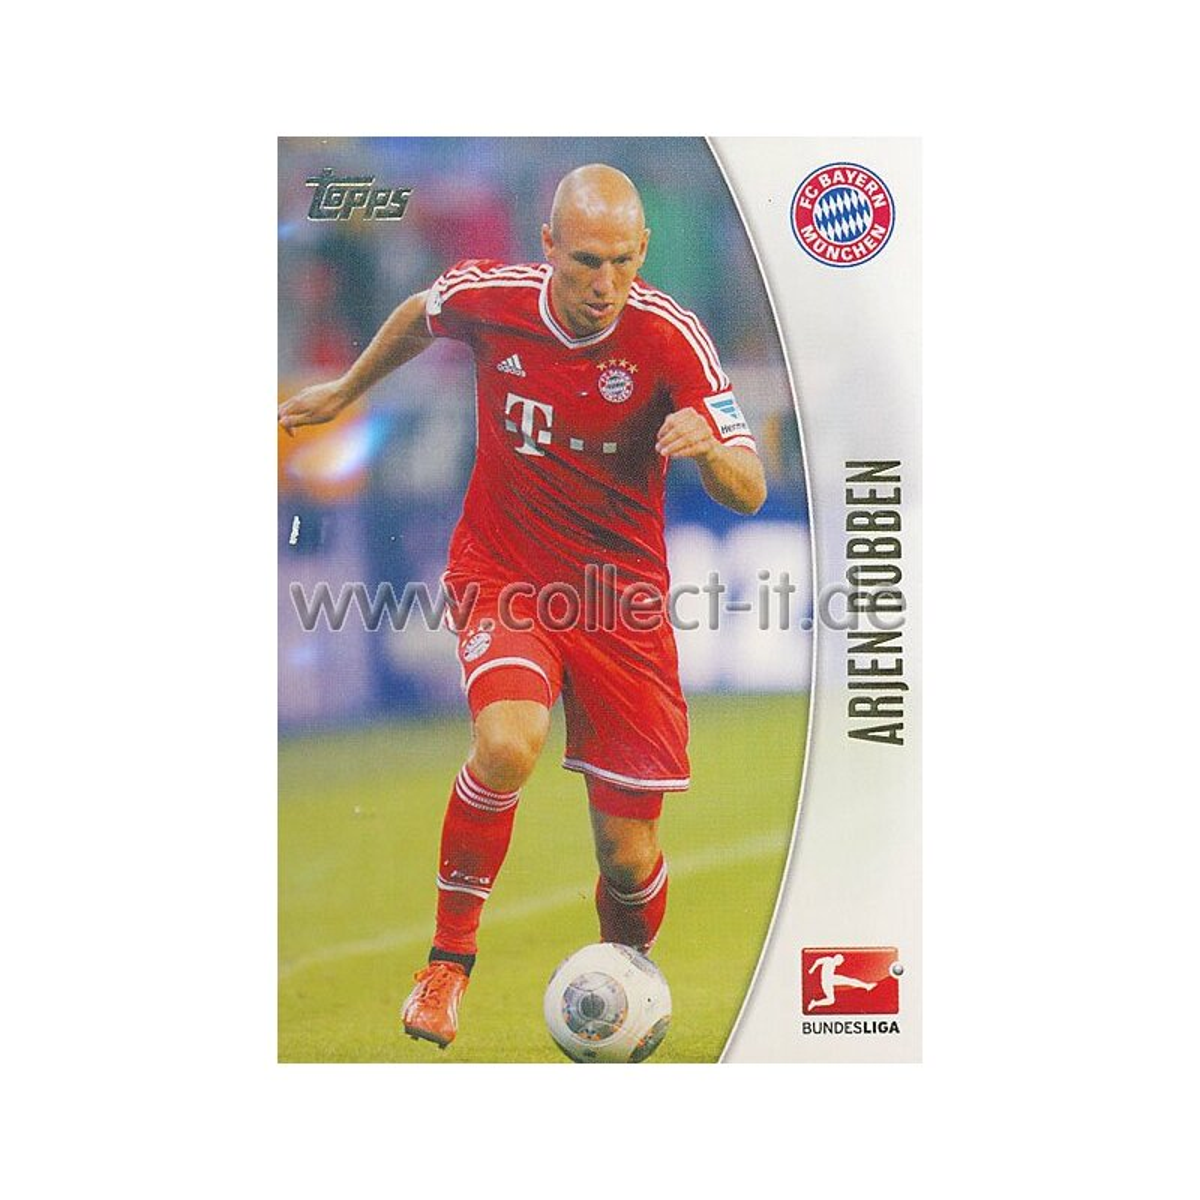 Club-Karte Topps Bundesliga Chrome 13//14-216 Hertha BSC